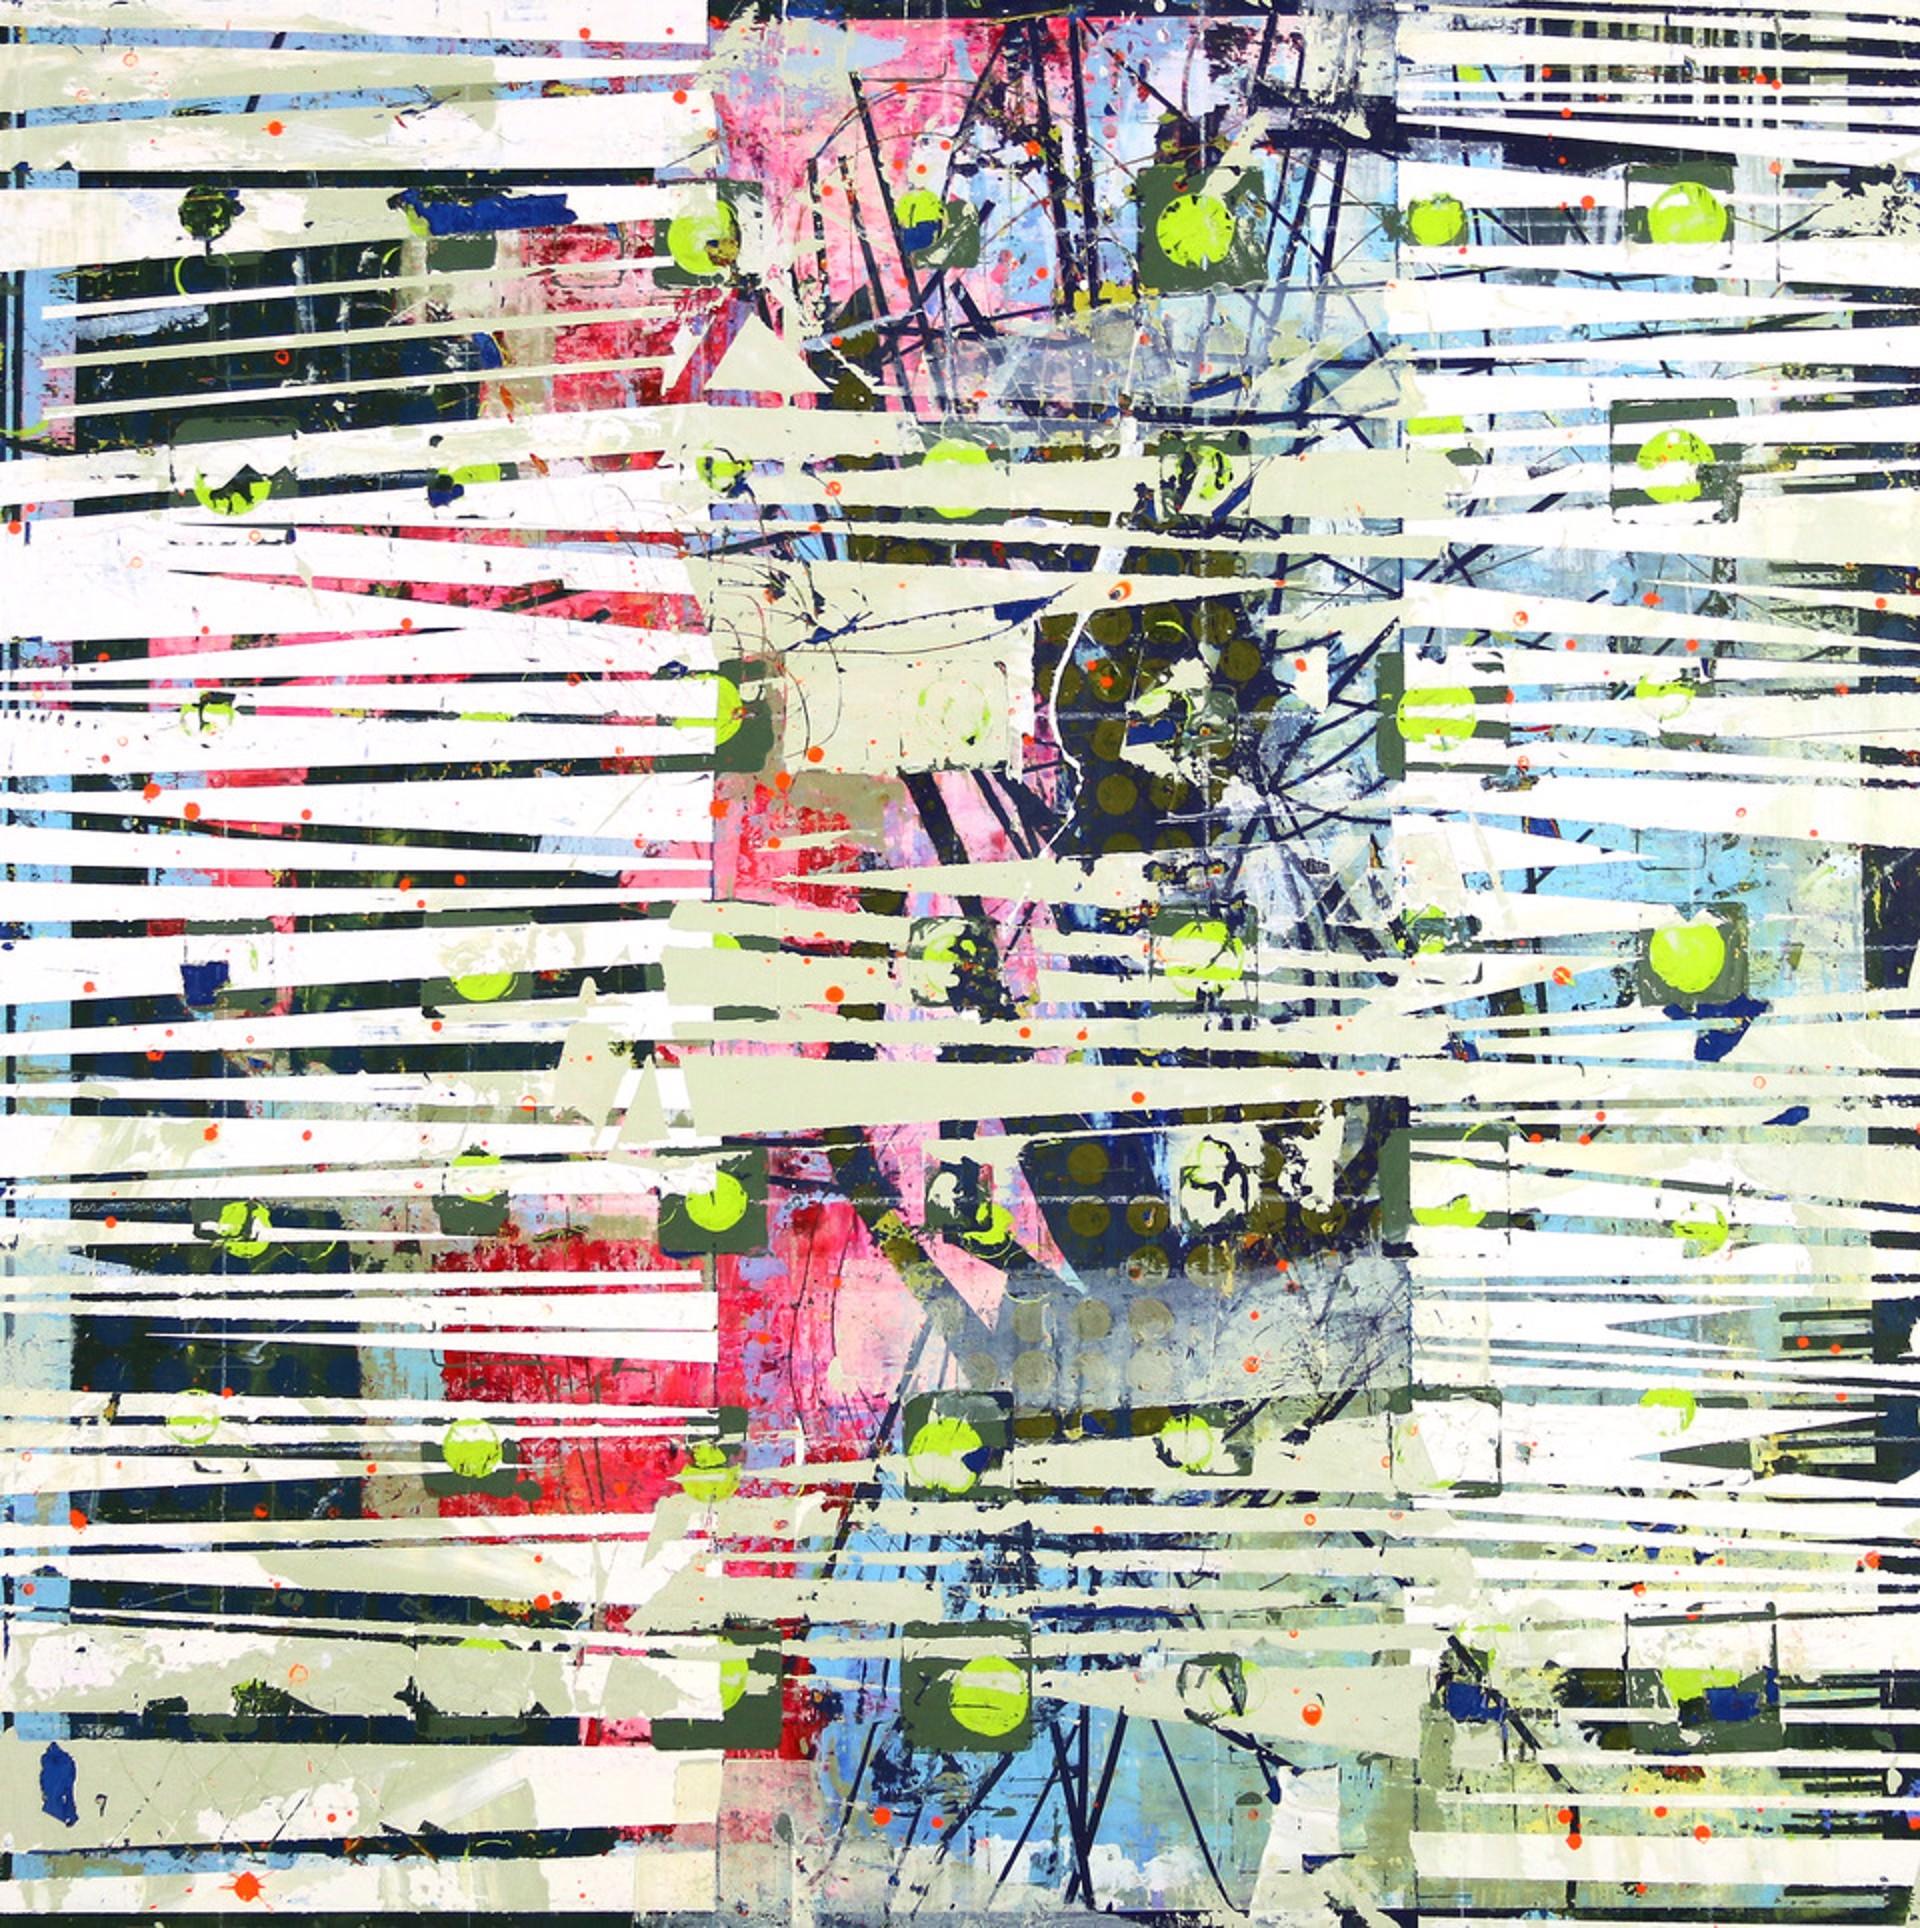 Entropy 42 by Jylian Gustlin